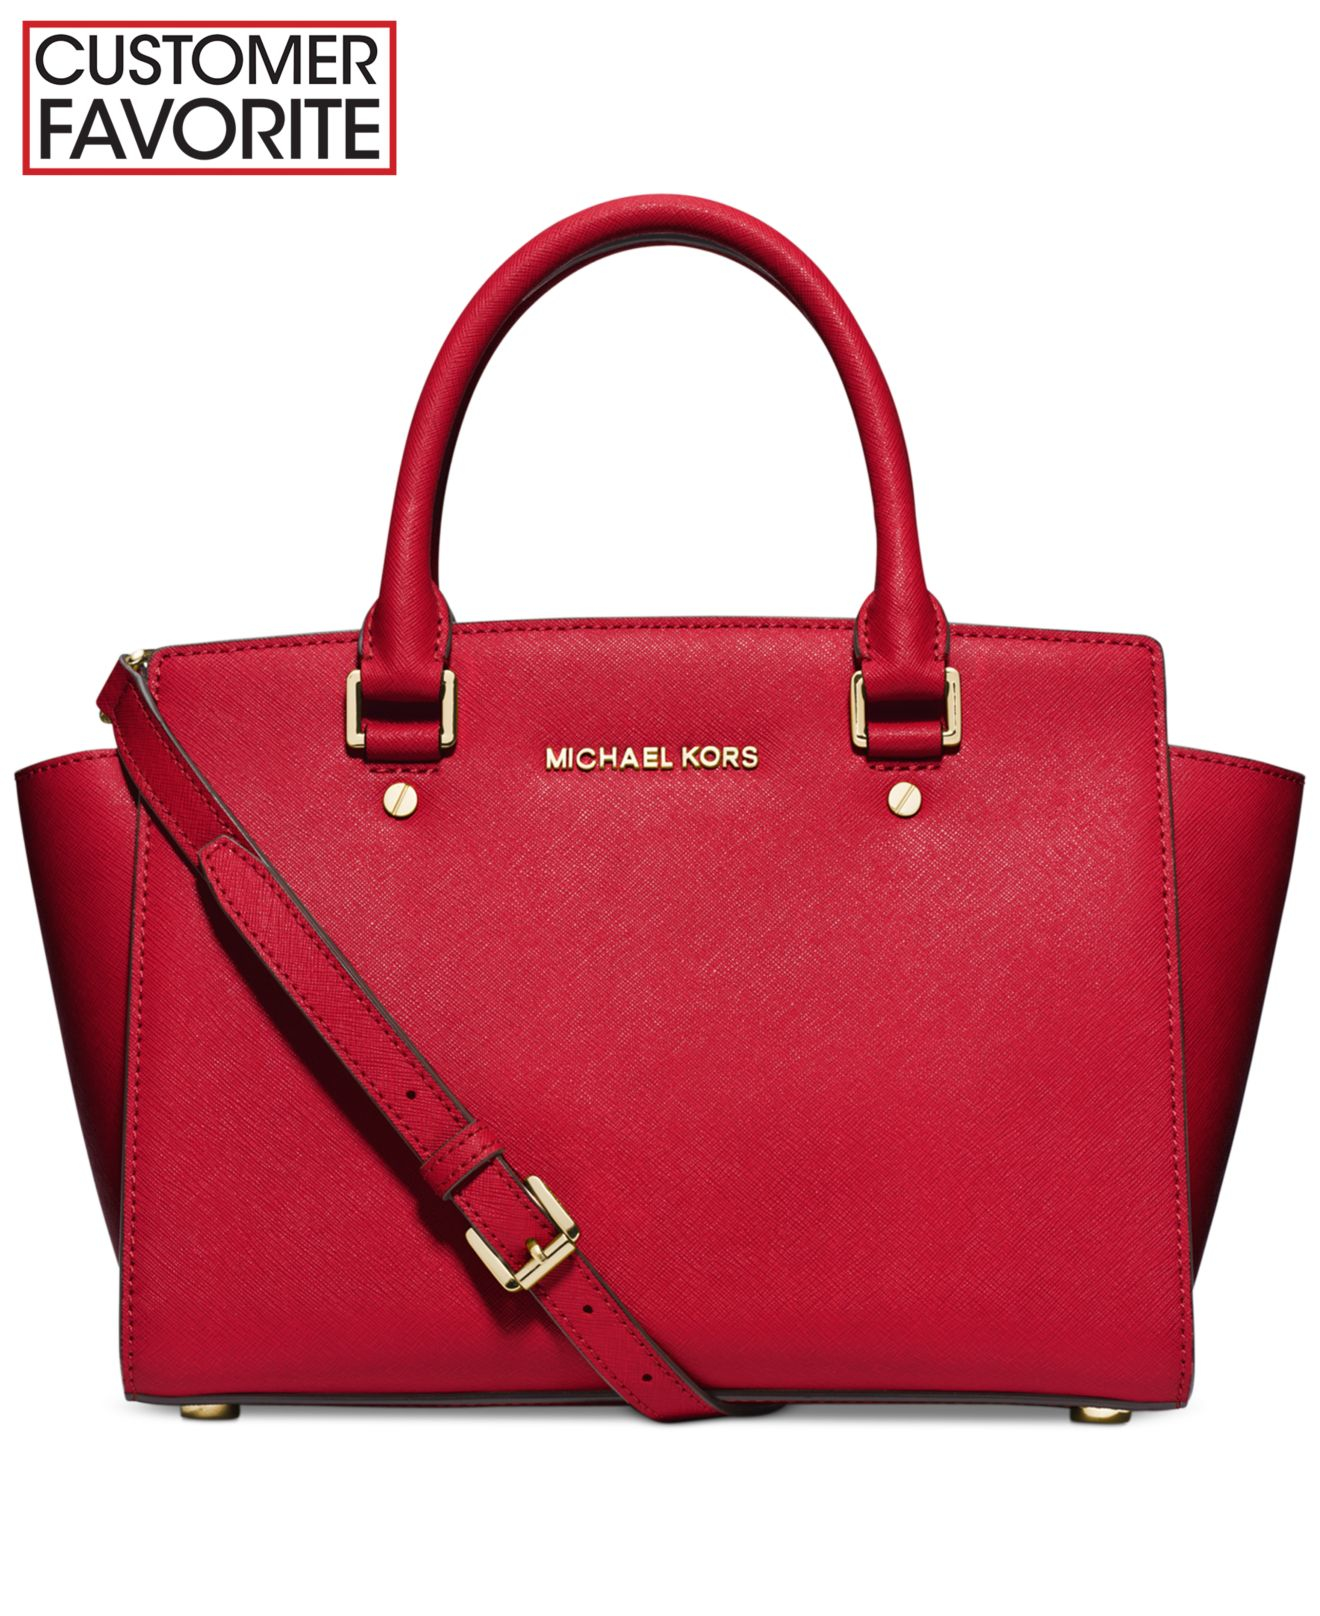 14690ac88f1620 Michael Kors Red Selma Bag Uk | Stanford Center for Opportunity ...